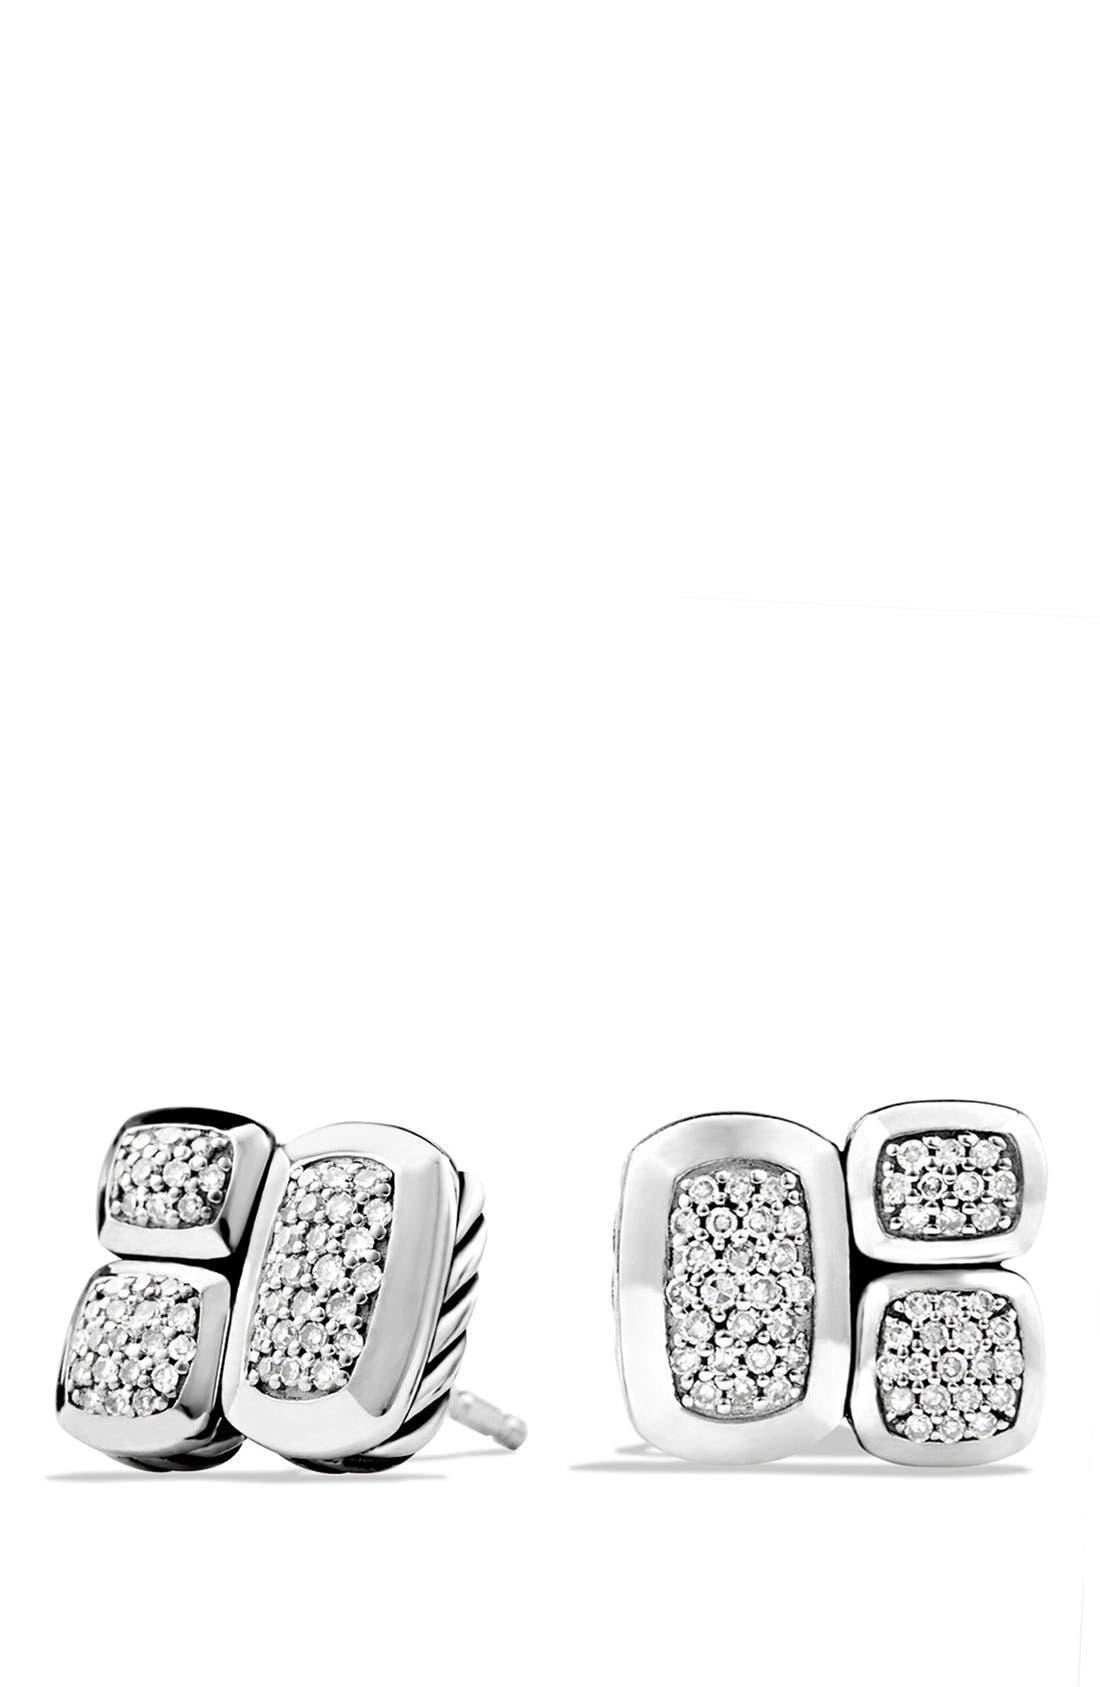 David Yurman 'Confetti' Stud Earrings with Diamonds